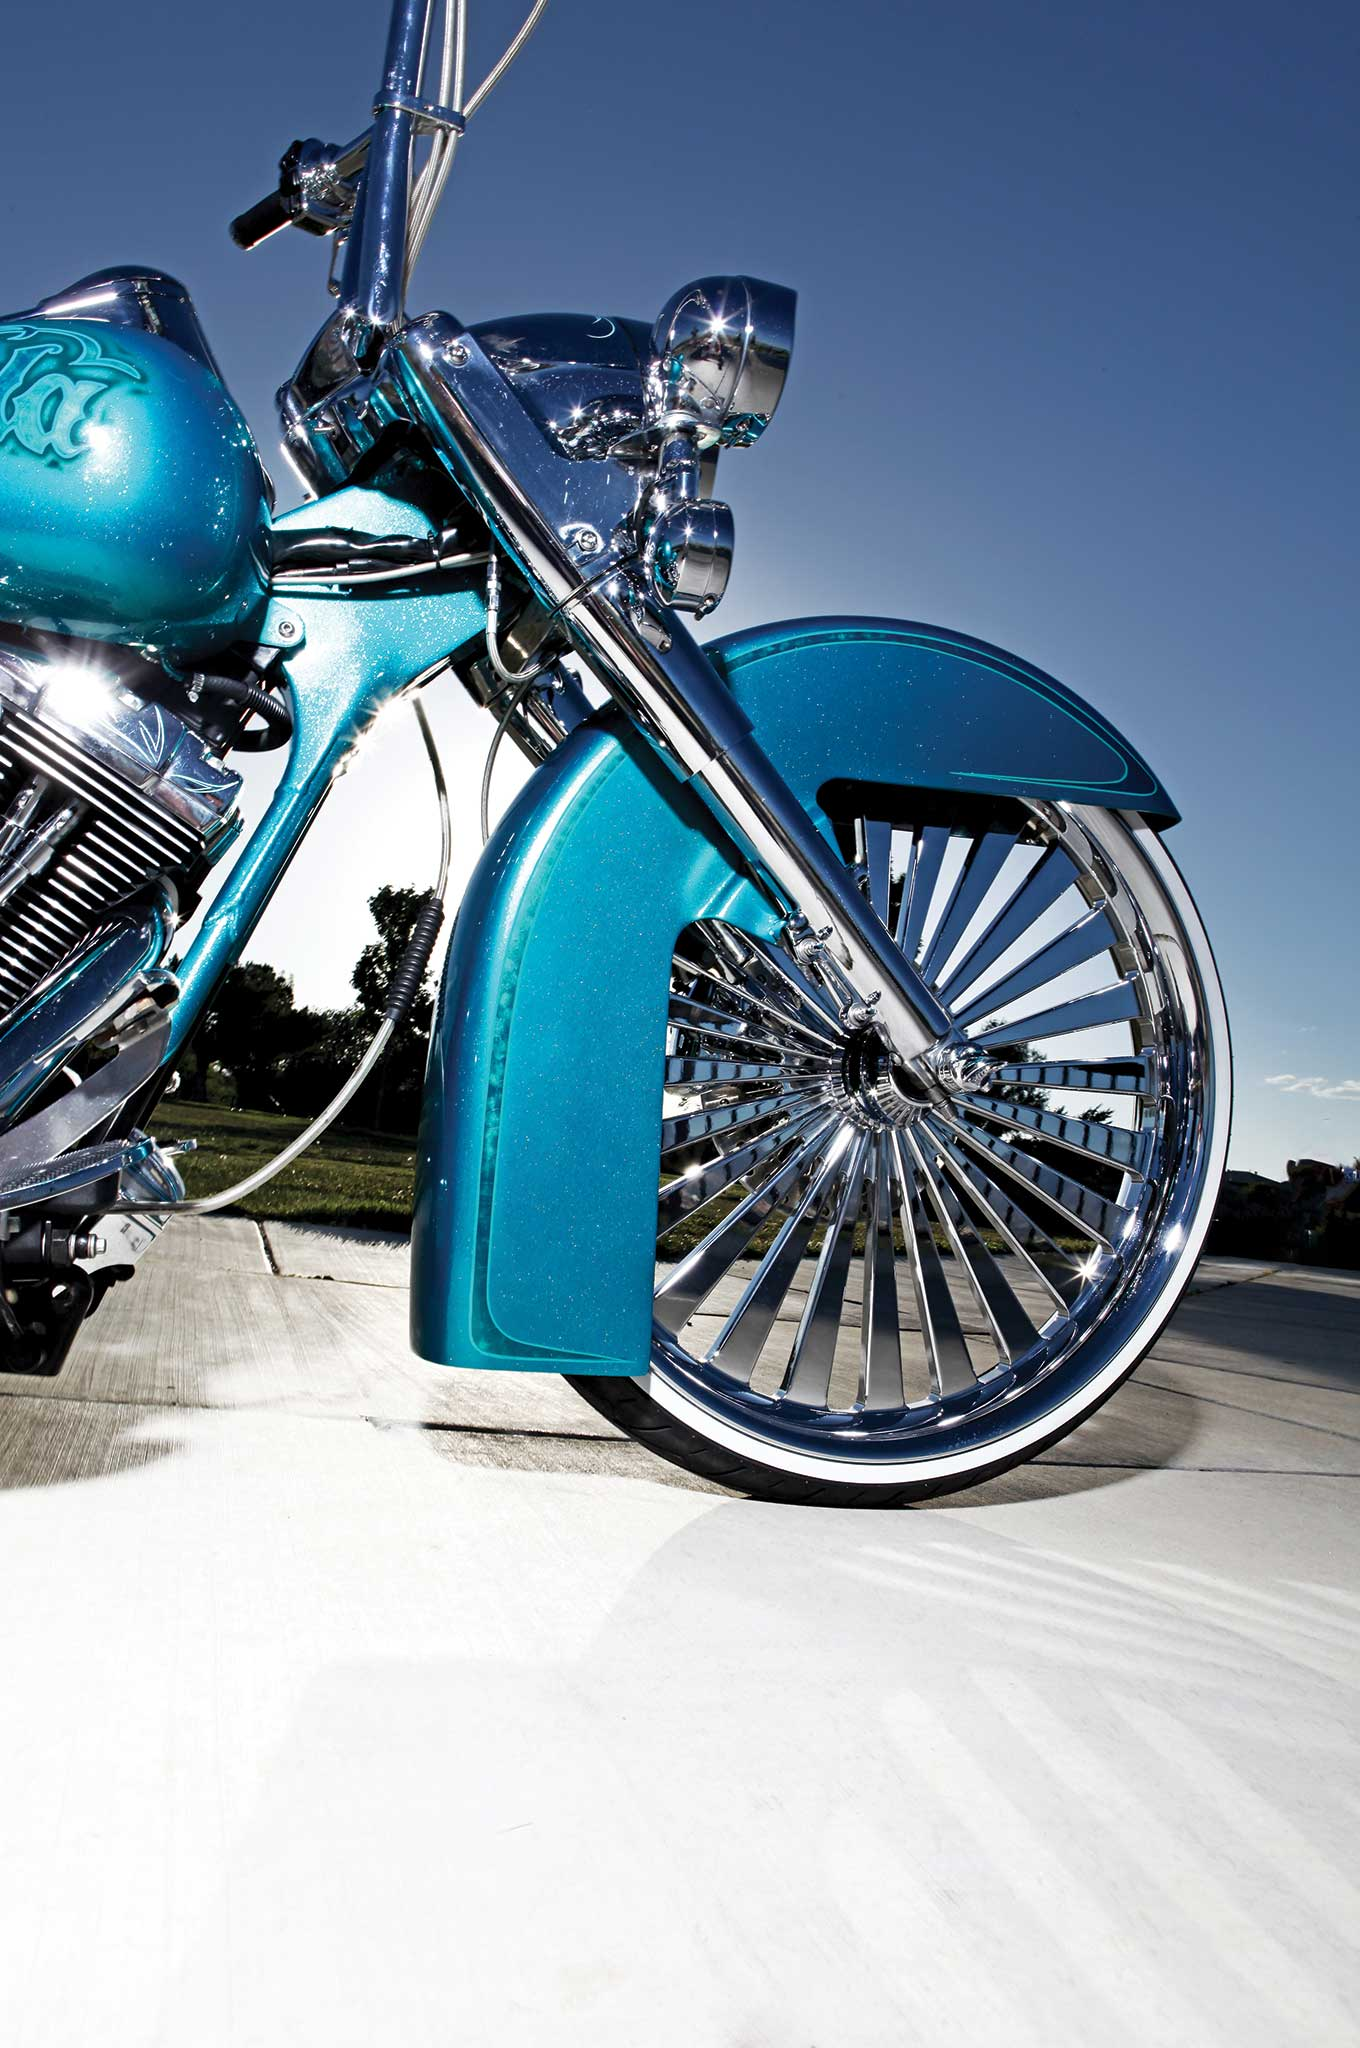 2004 harley davidson road king smt machine chrome wheel 002